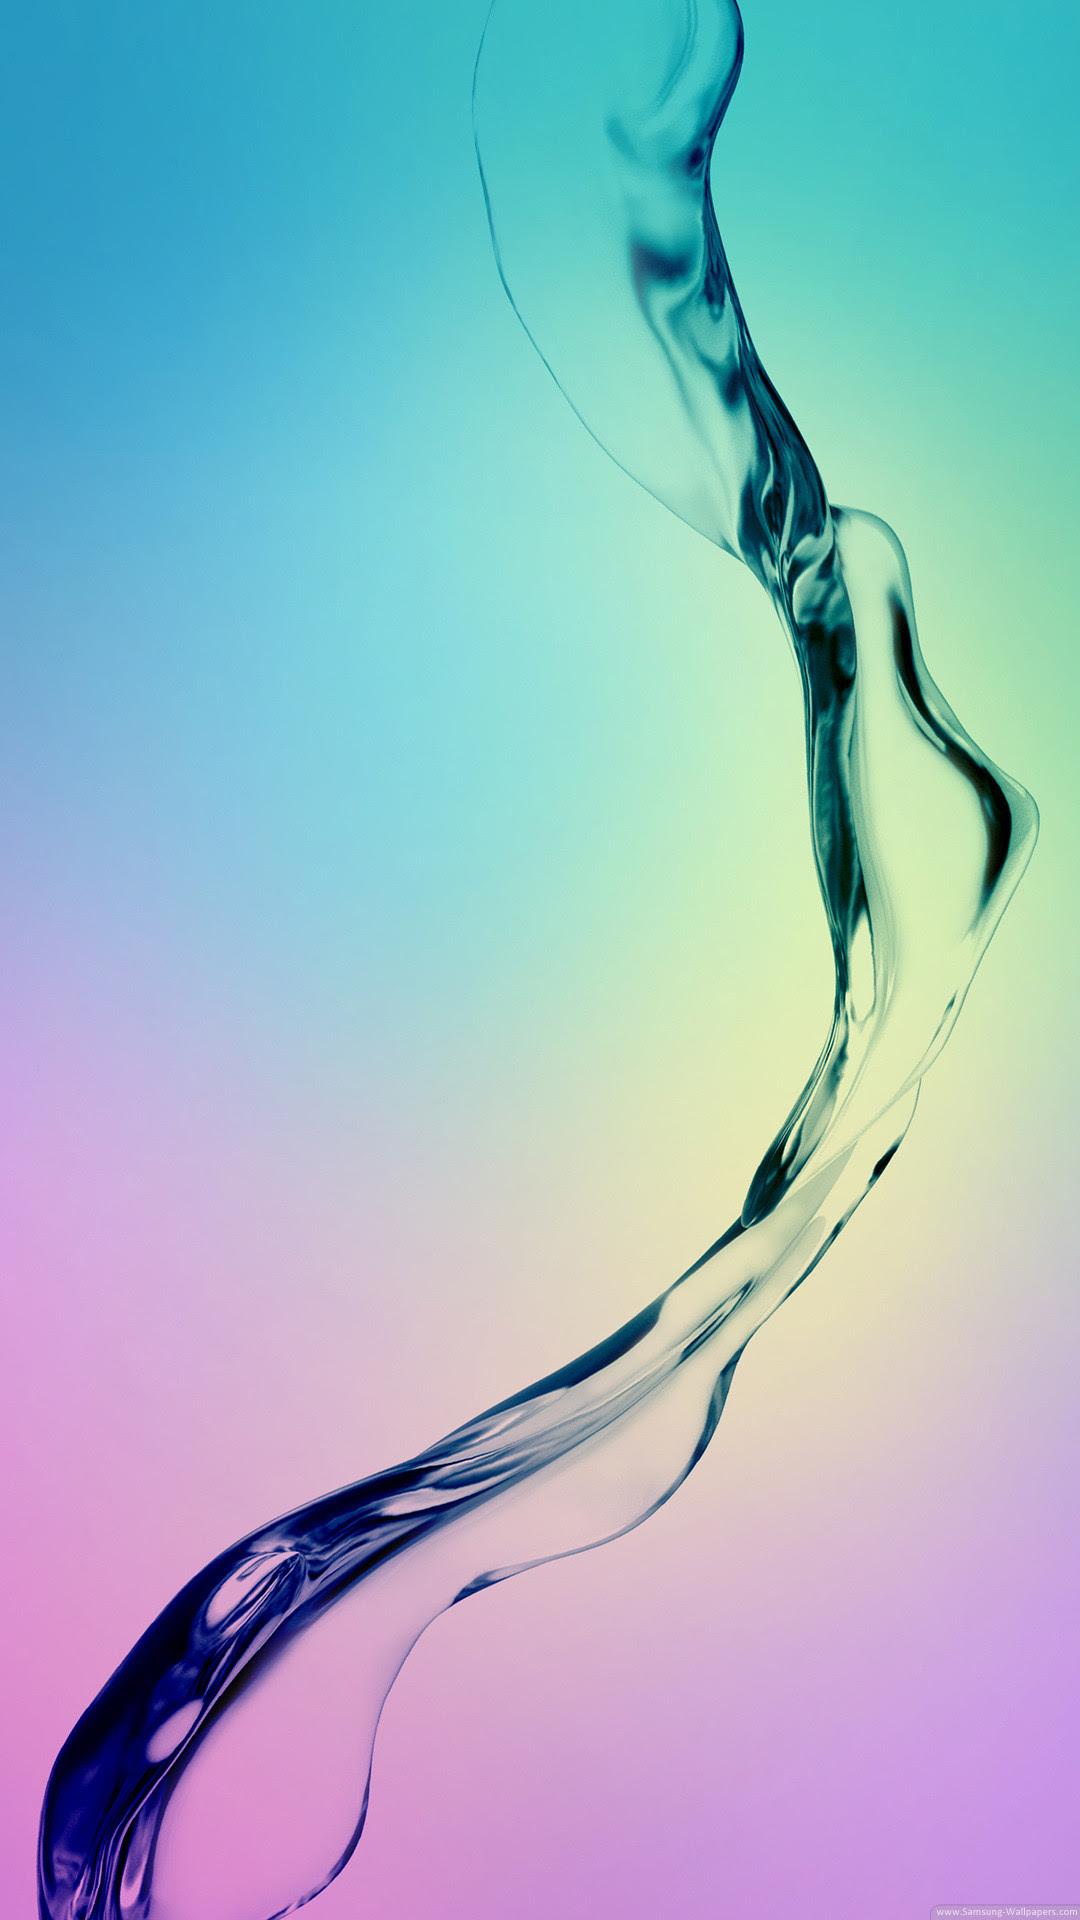 Samsung Galaxy S6 Wallpaper 88 Images